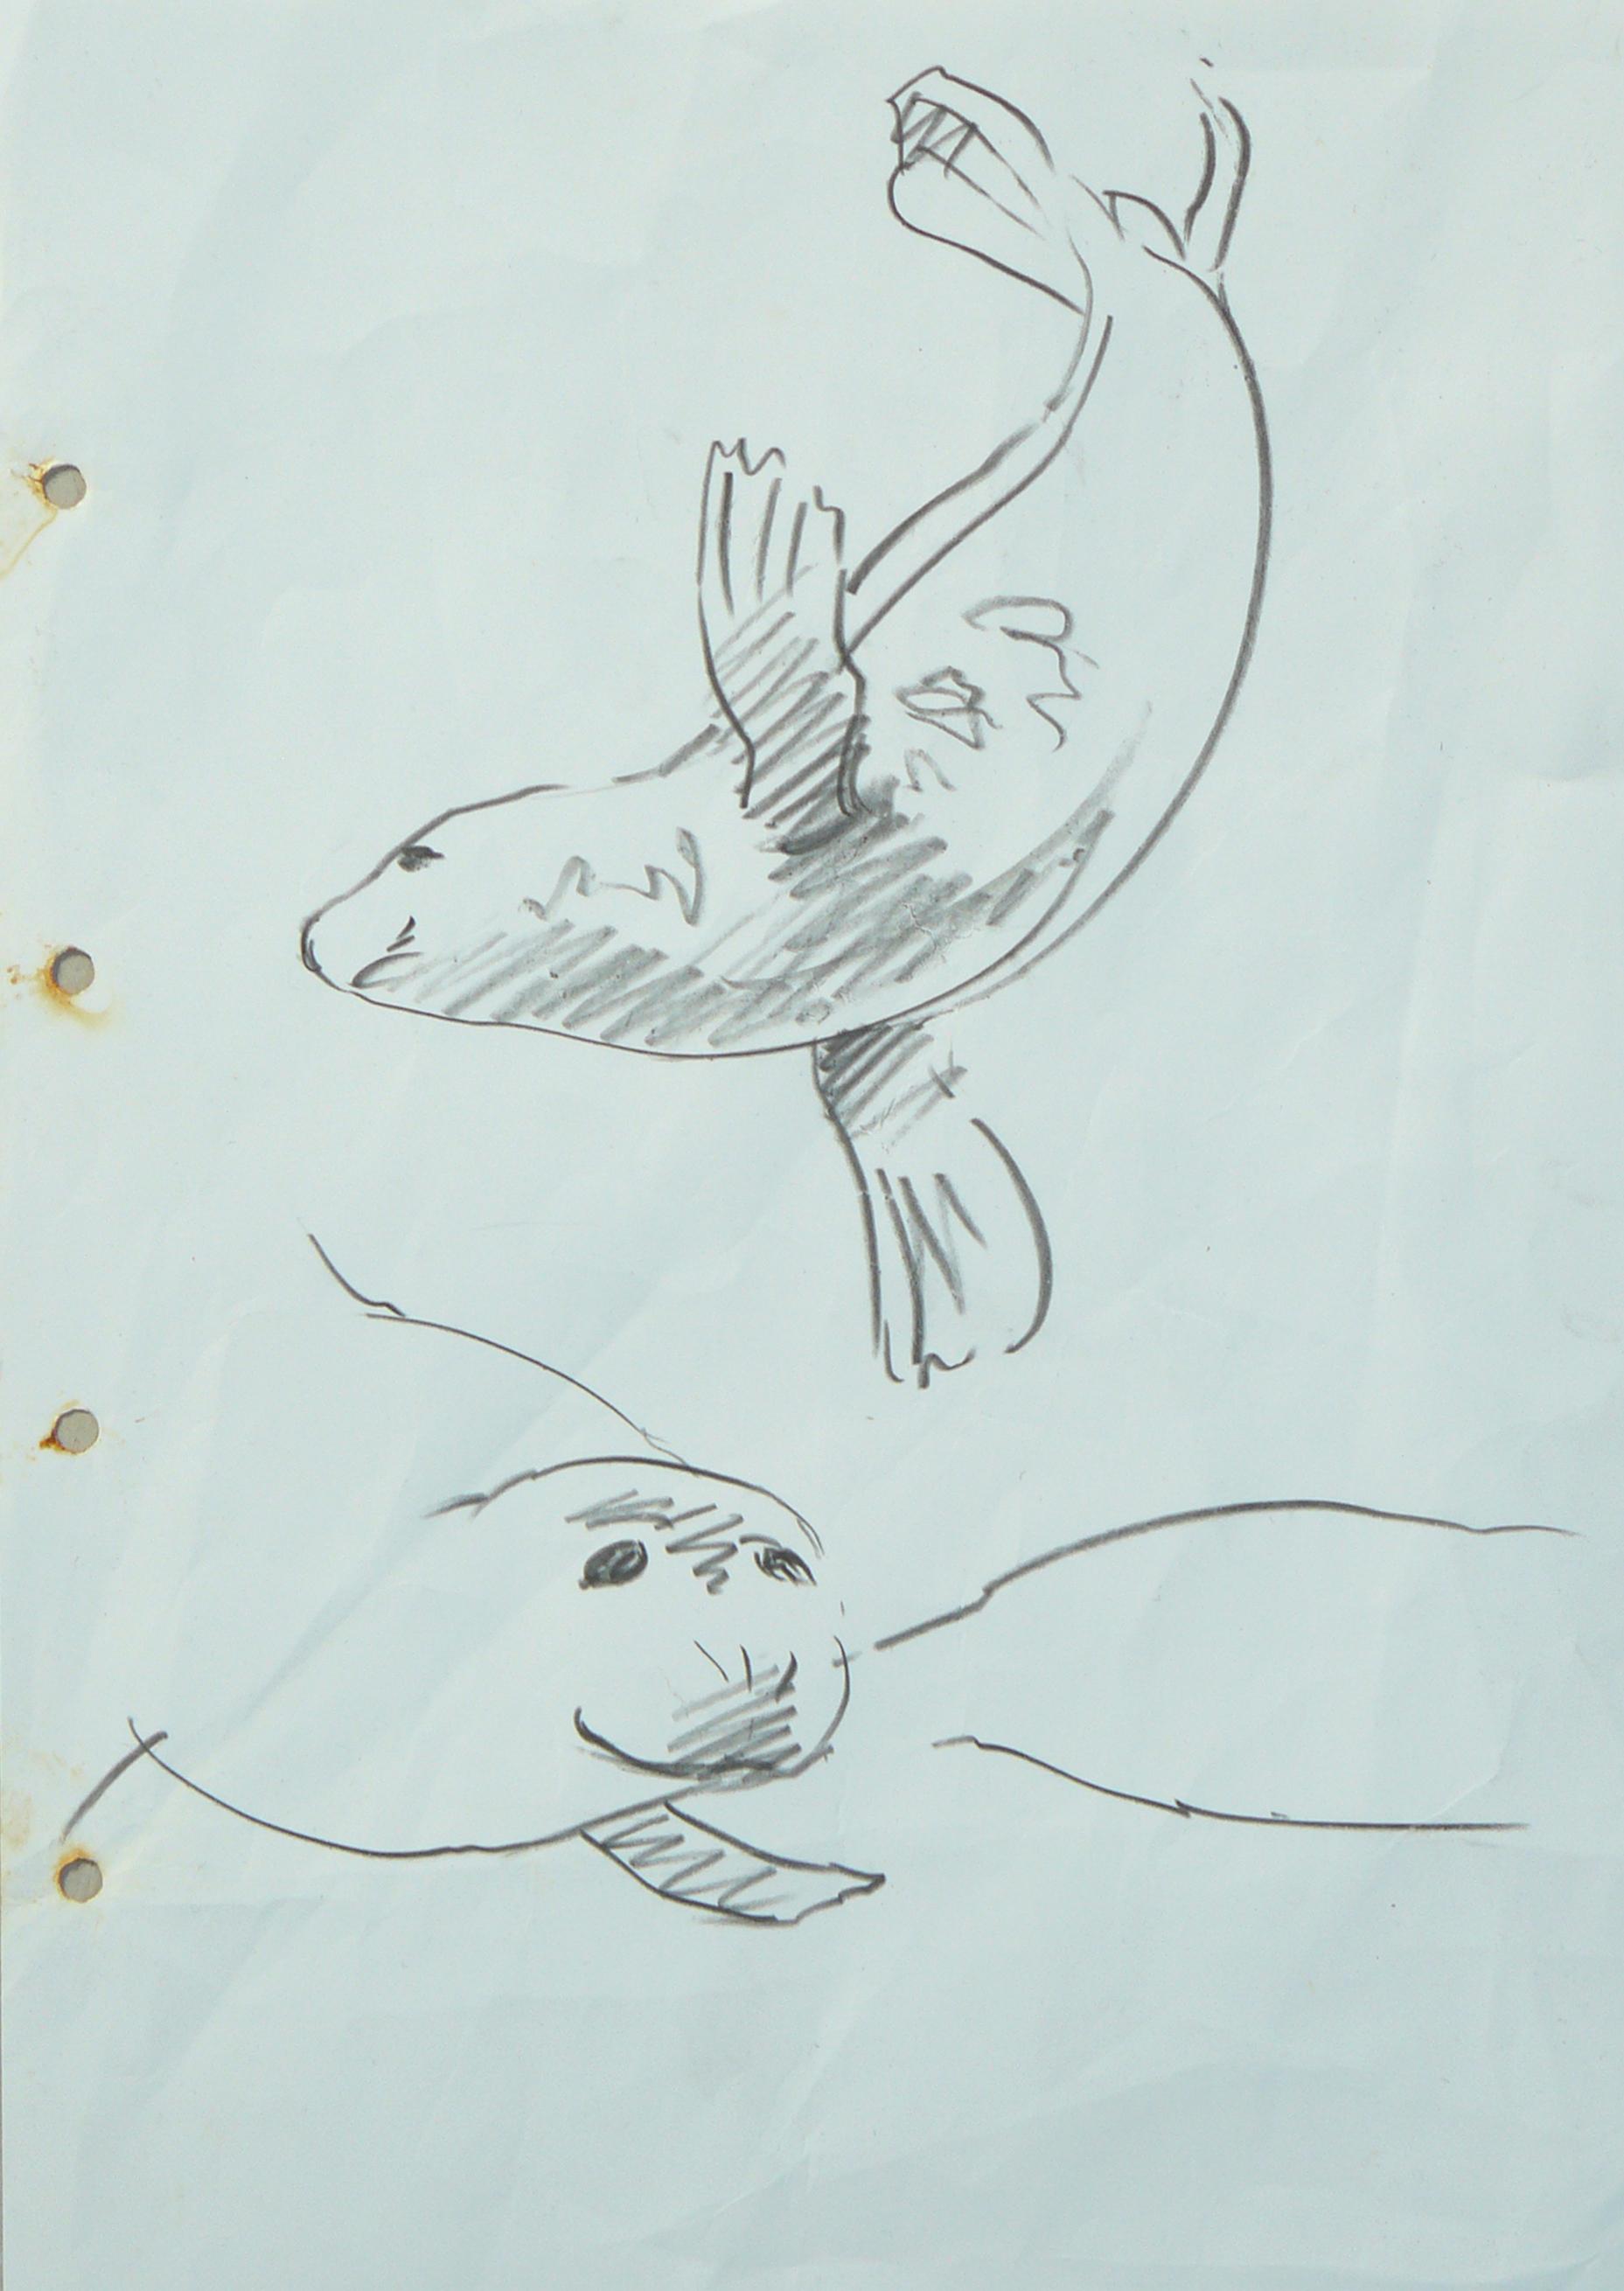 <p>Seal sketch, Chris Rose</p>